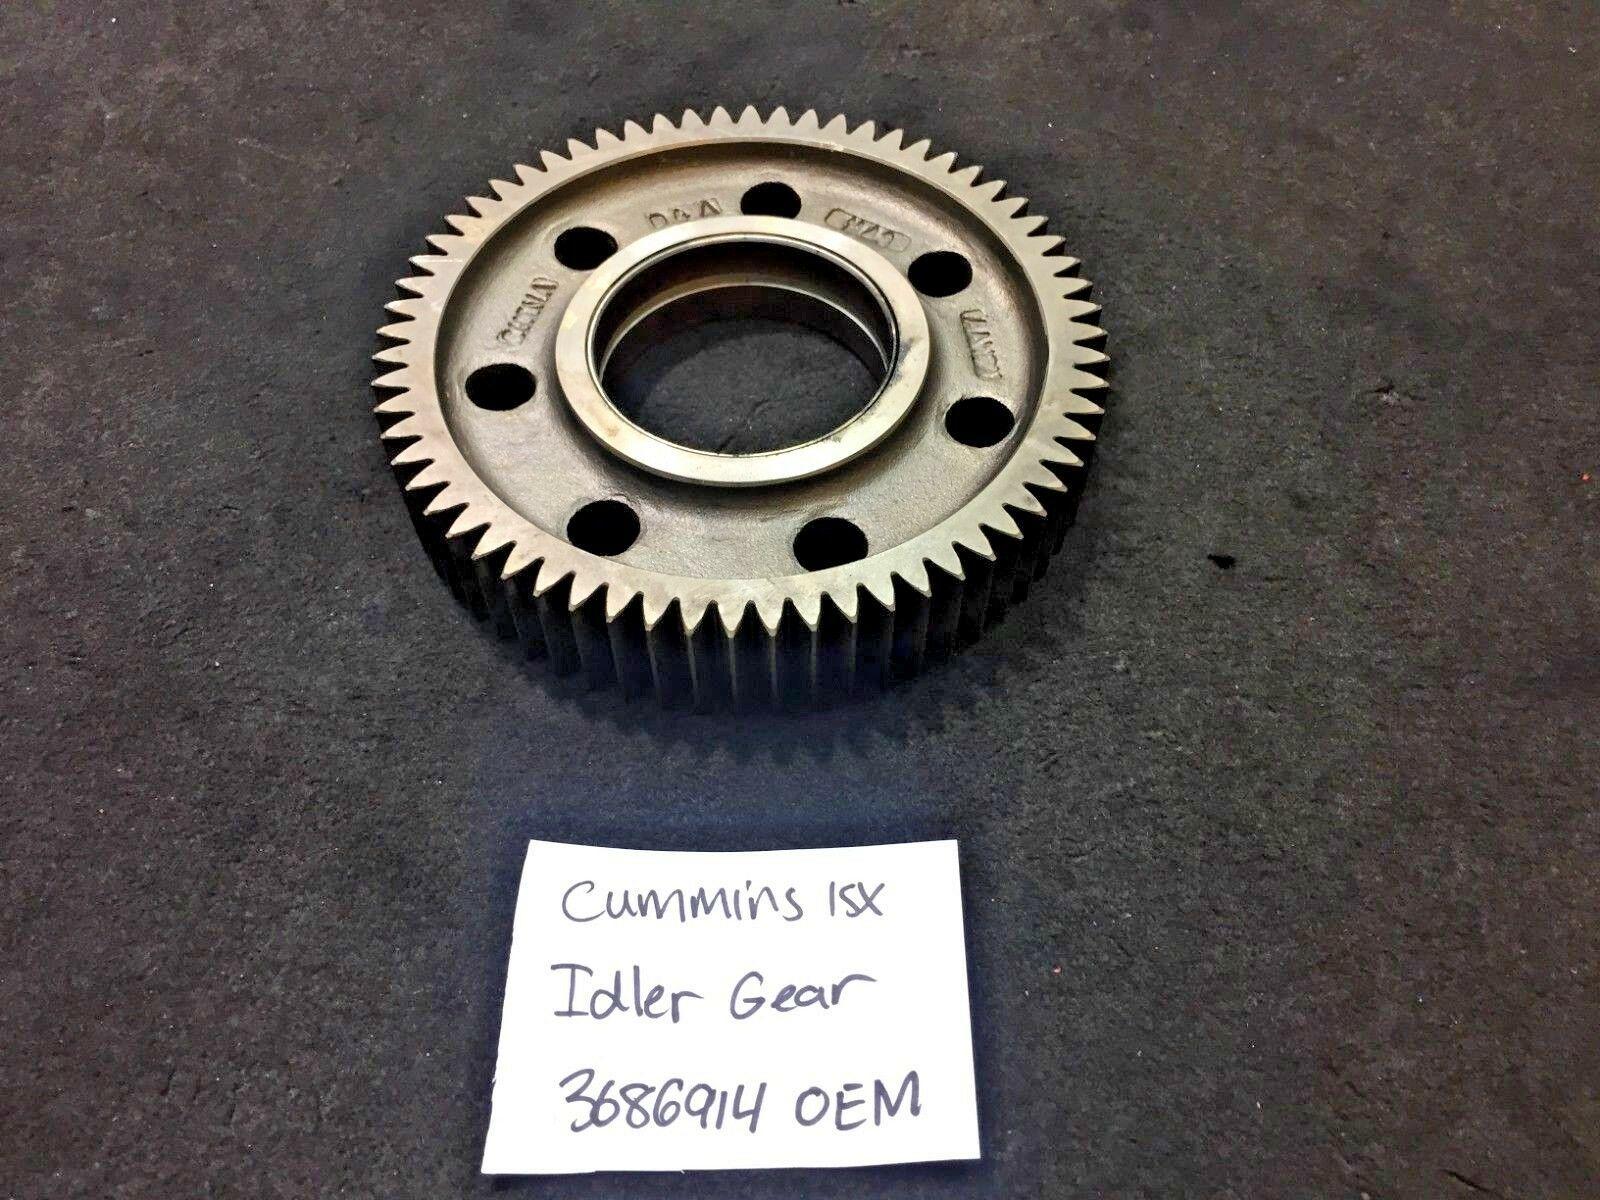 Cummins ISX15 DIESEL ENGINE IDLER GEAR 3686914 OEM